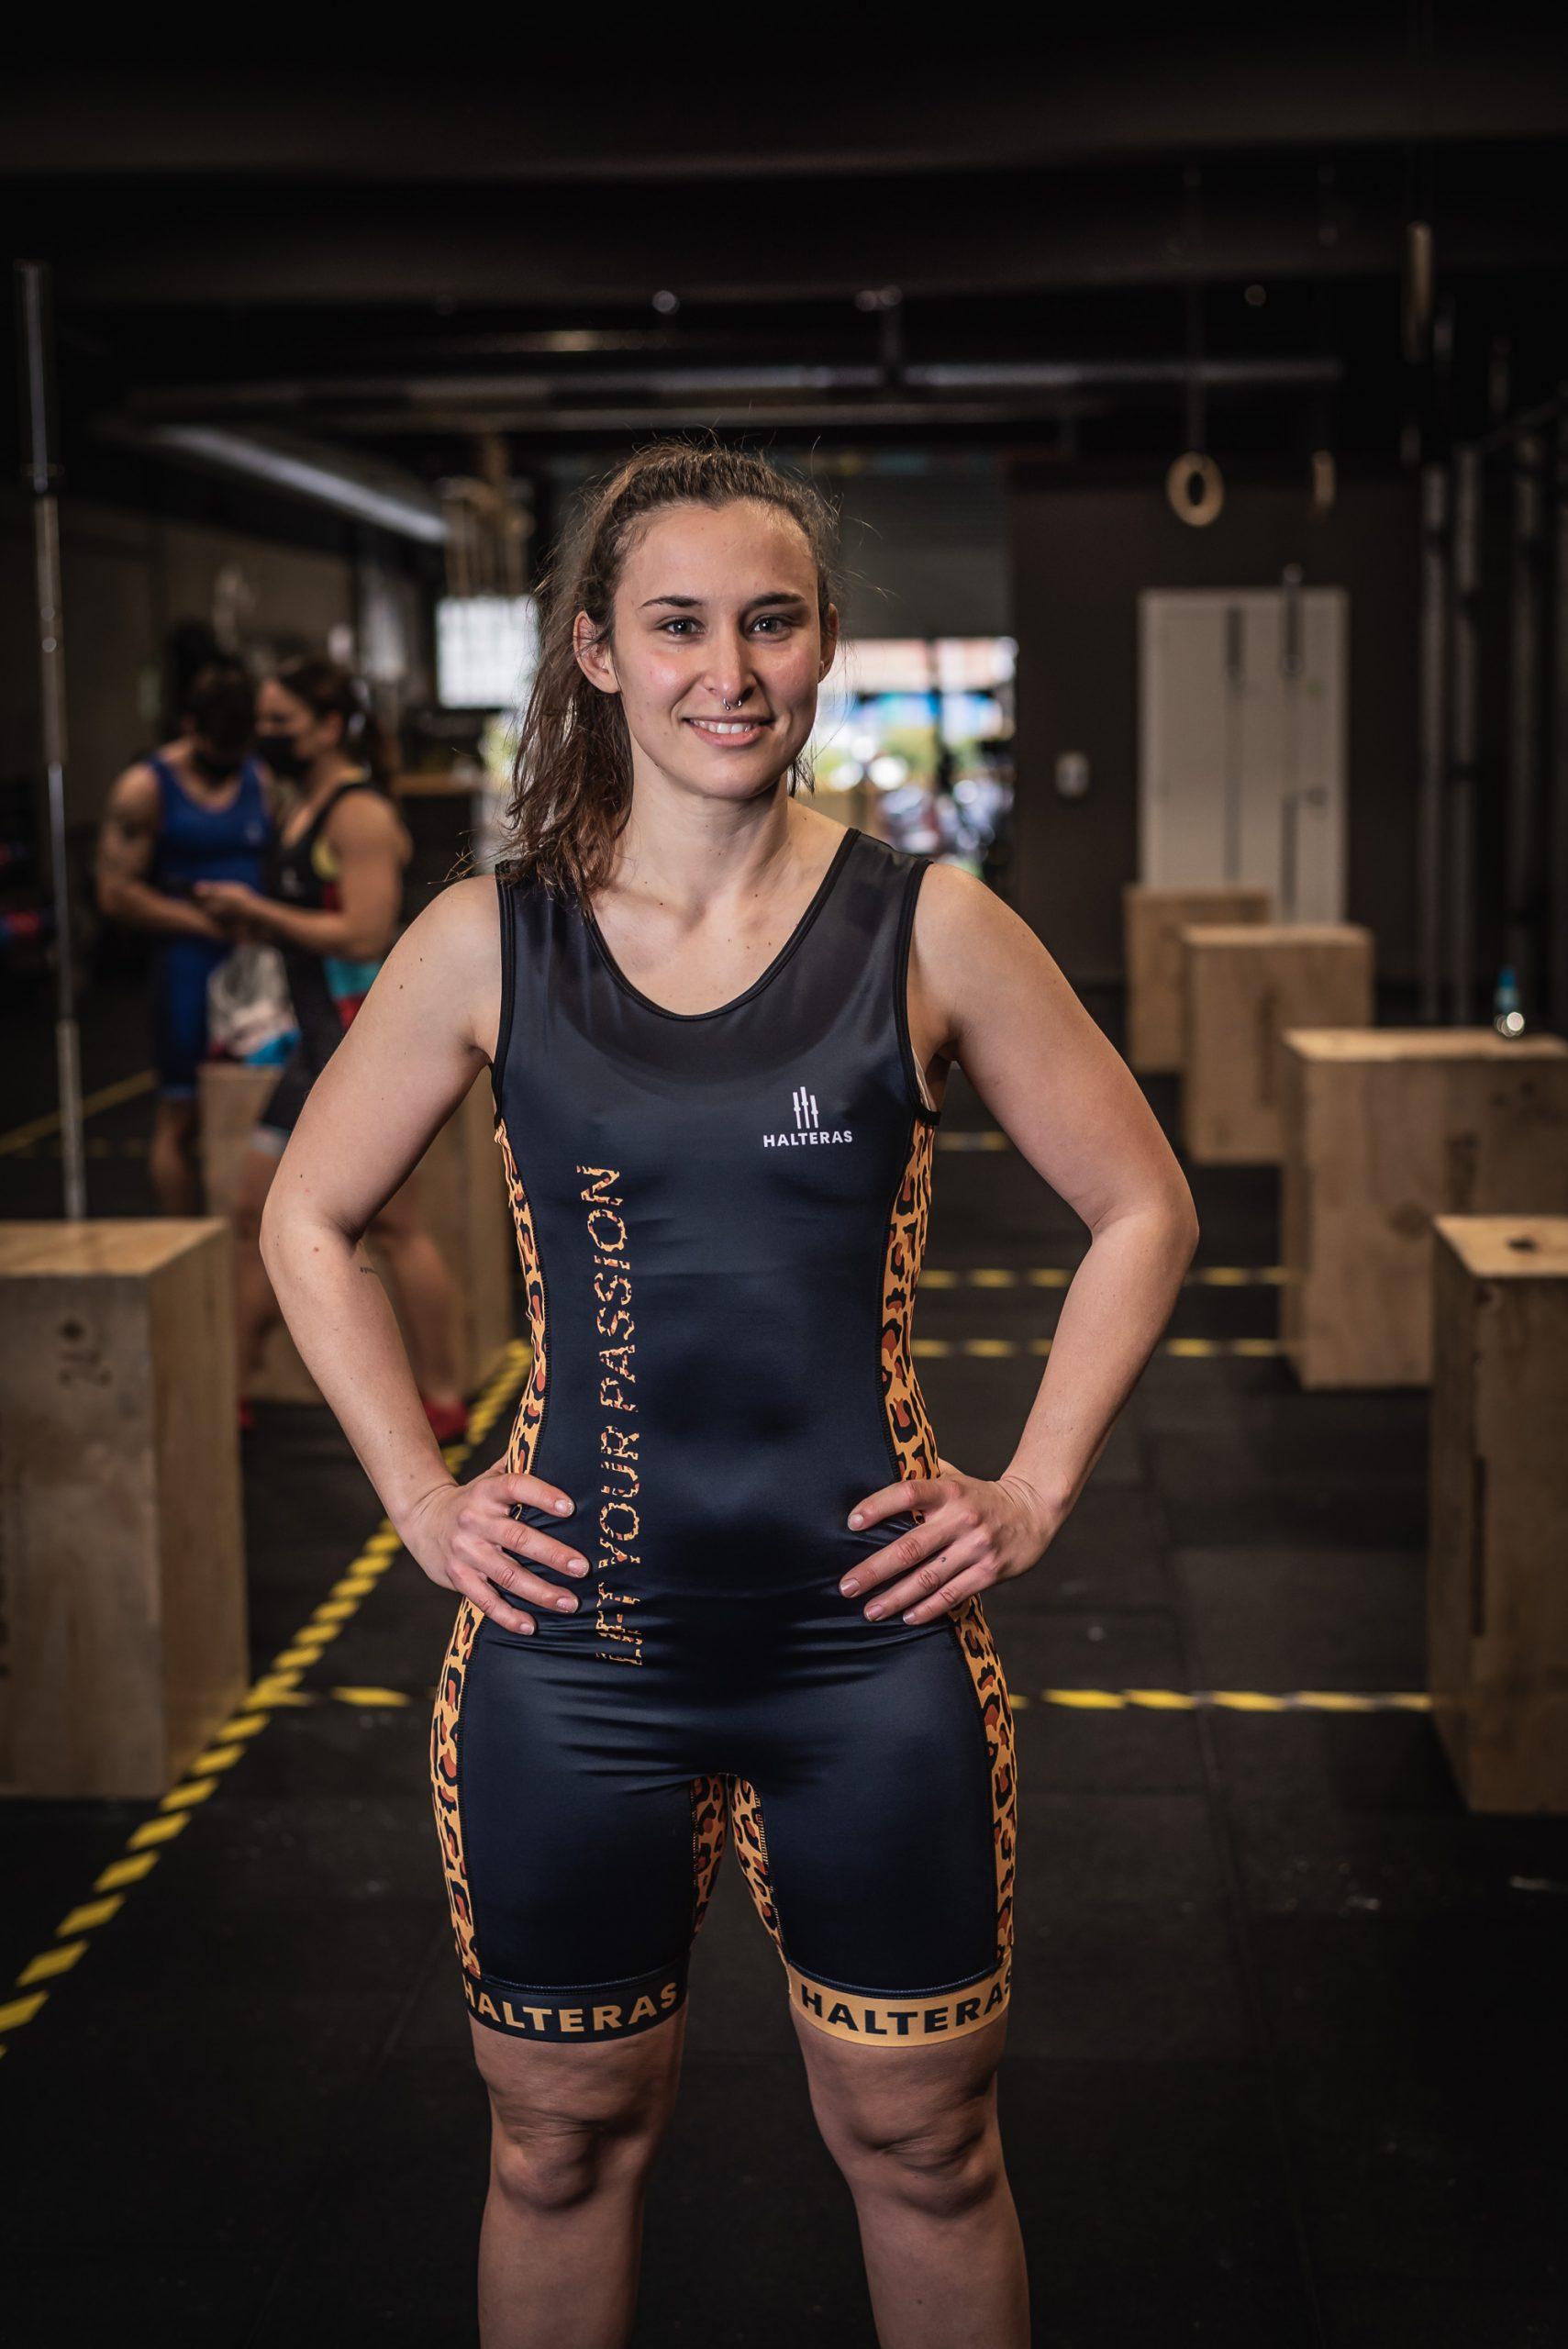 Maillot de weightlifting femenino